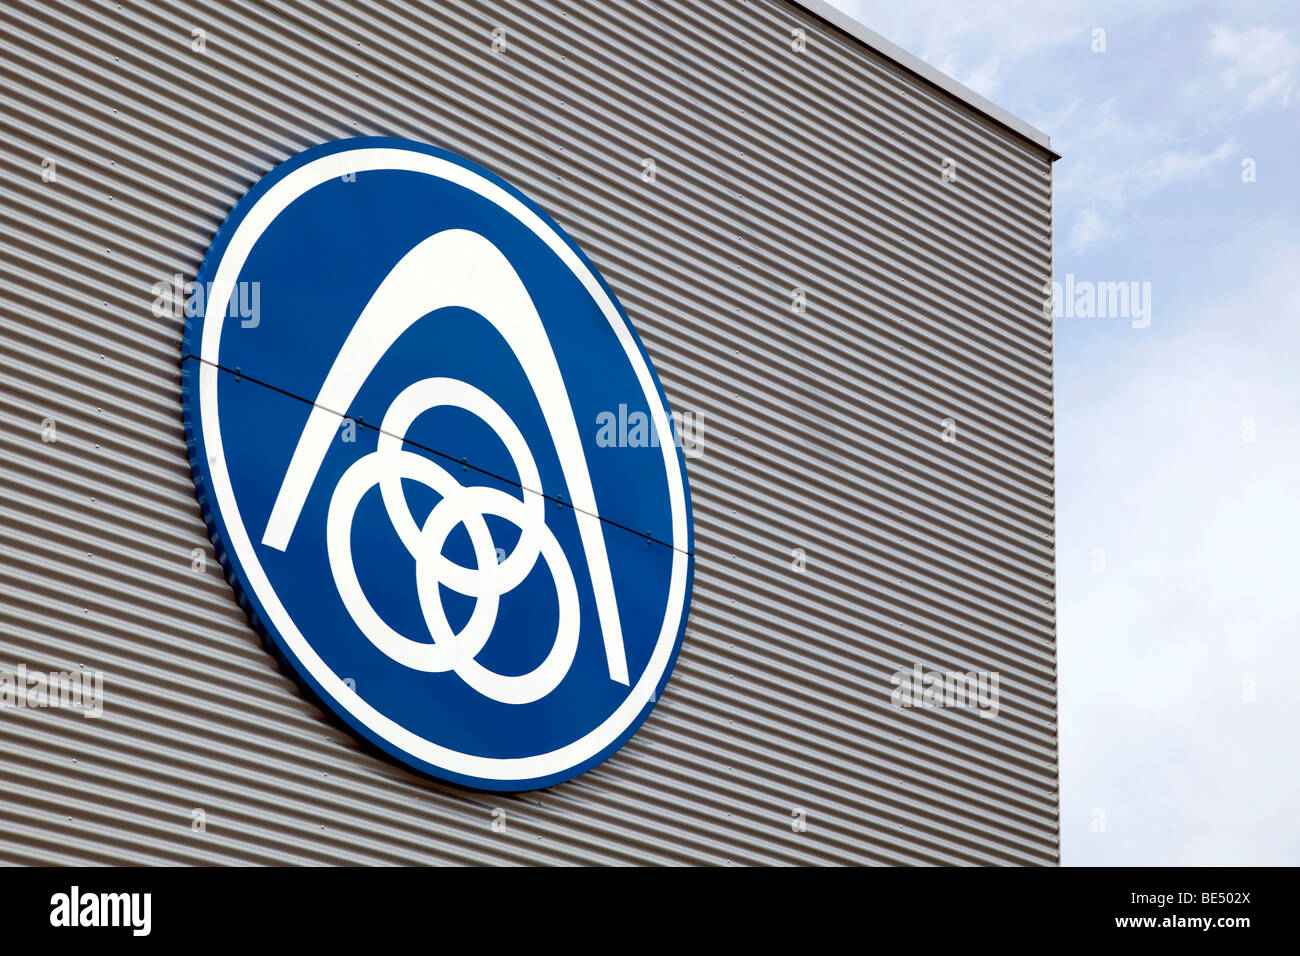 logo of the thyssenkrupp stahl ag company in regensburg. Black Bedroom Furniture Sets. Home Design Ideas